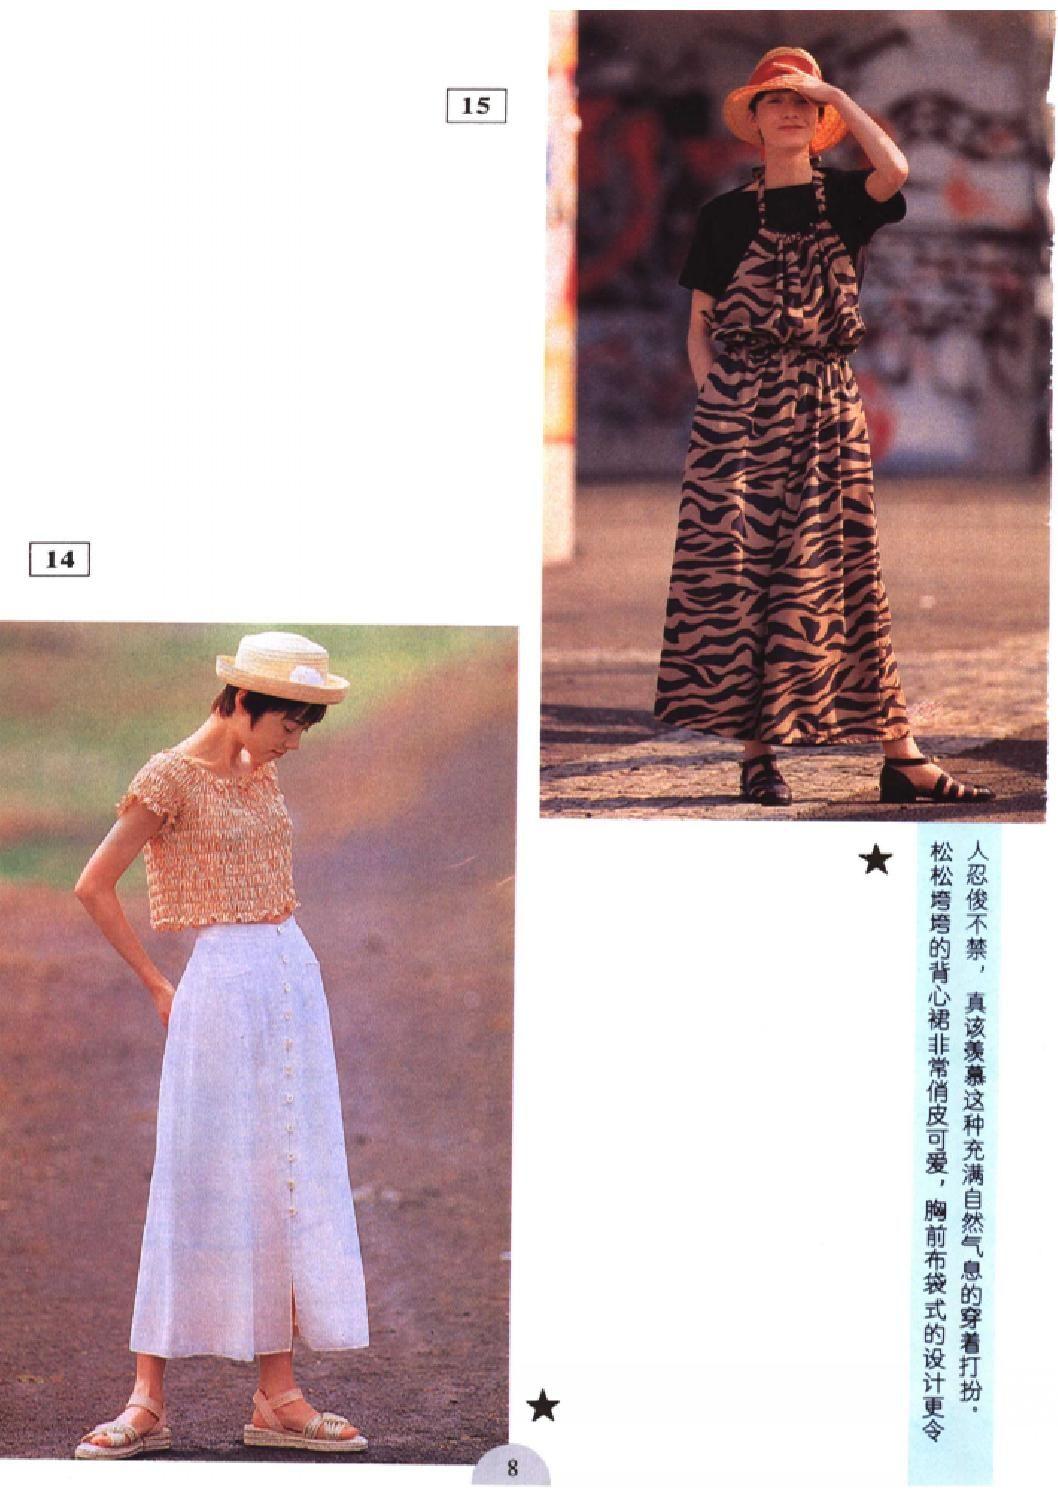 1990s casual China   это интересно   Pinterest